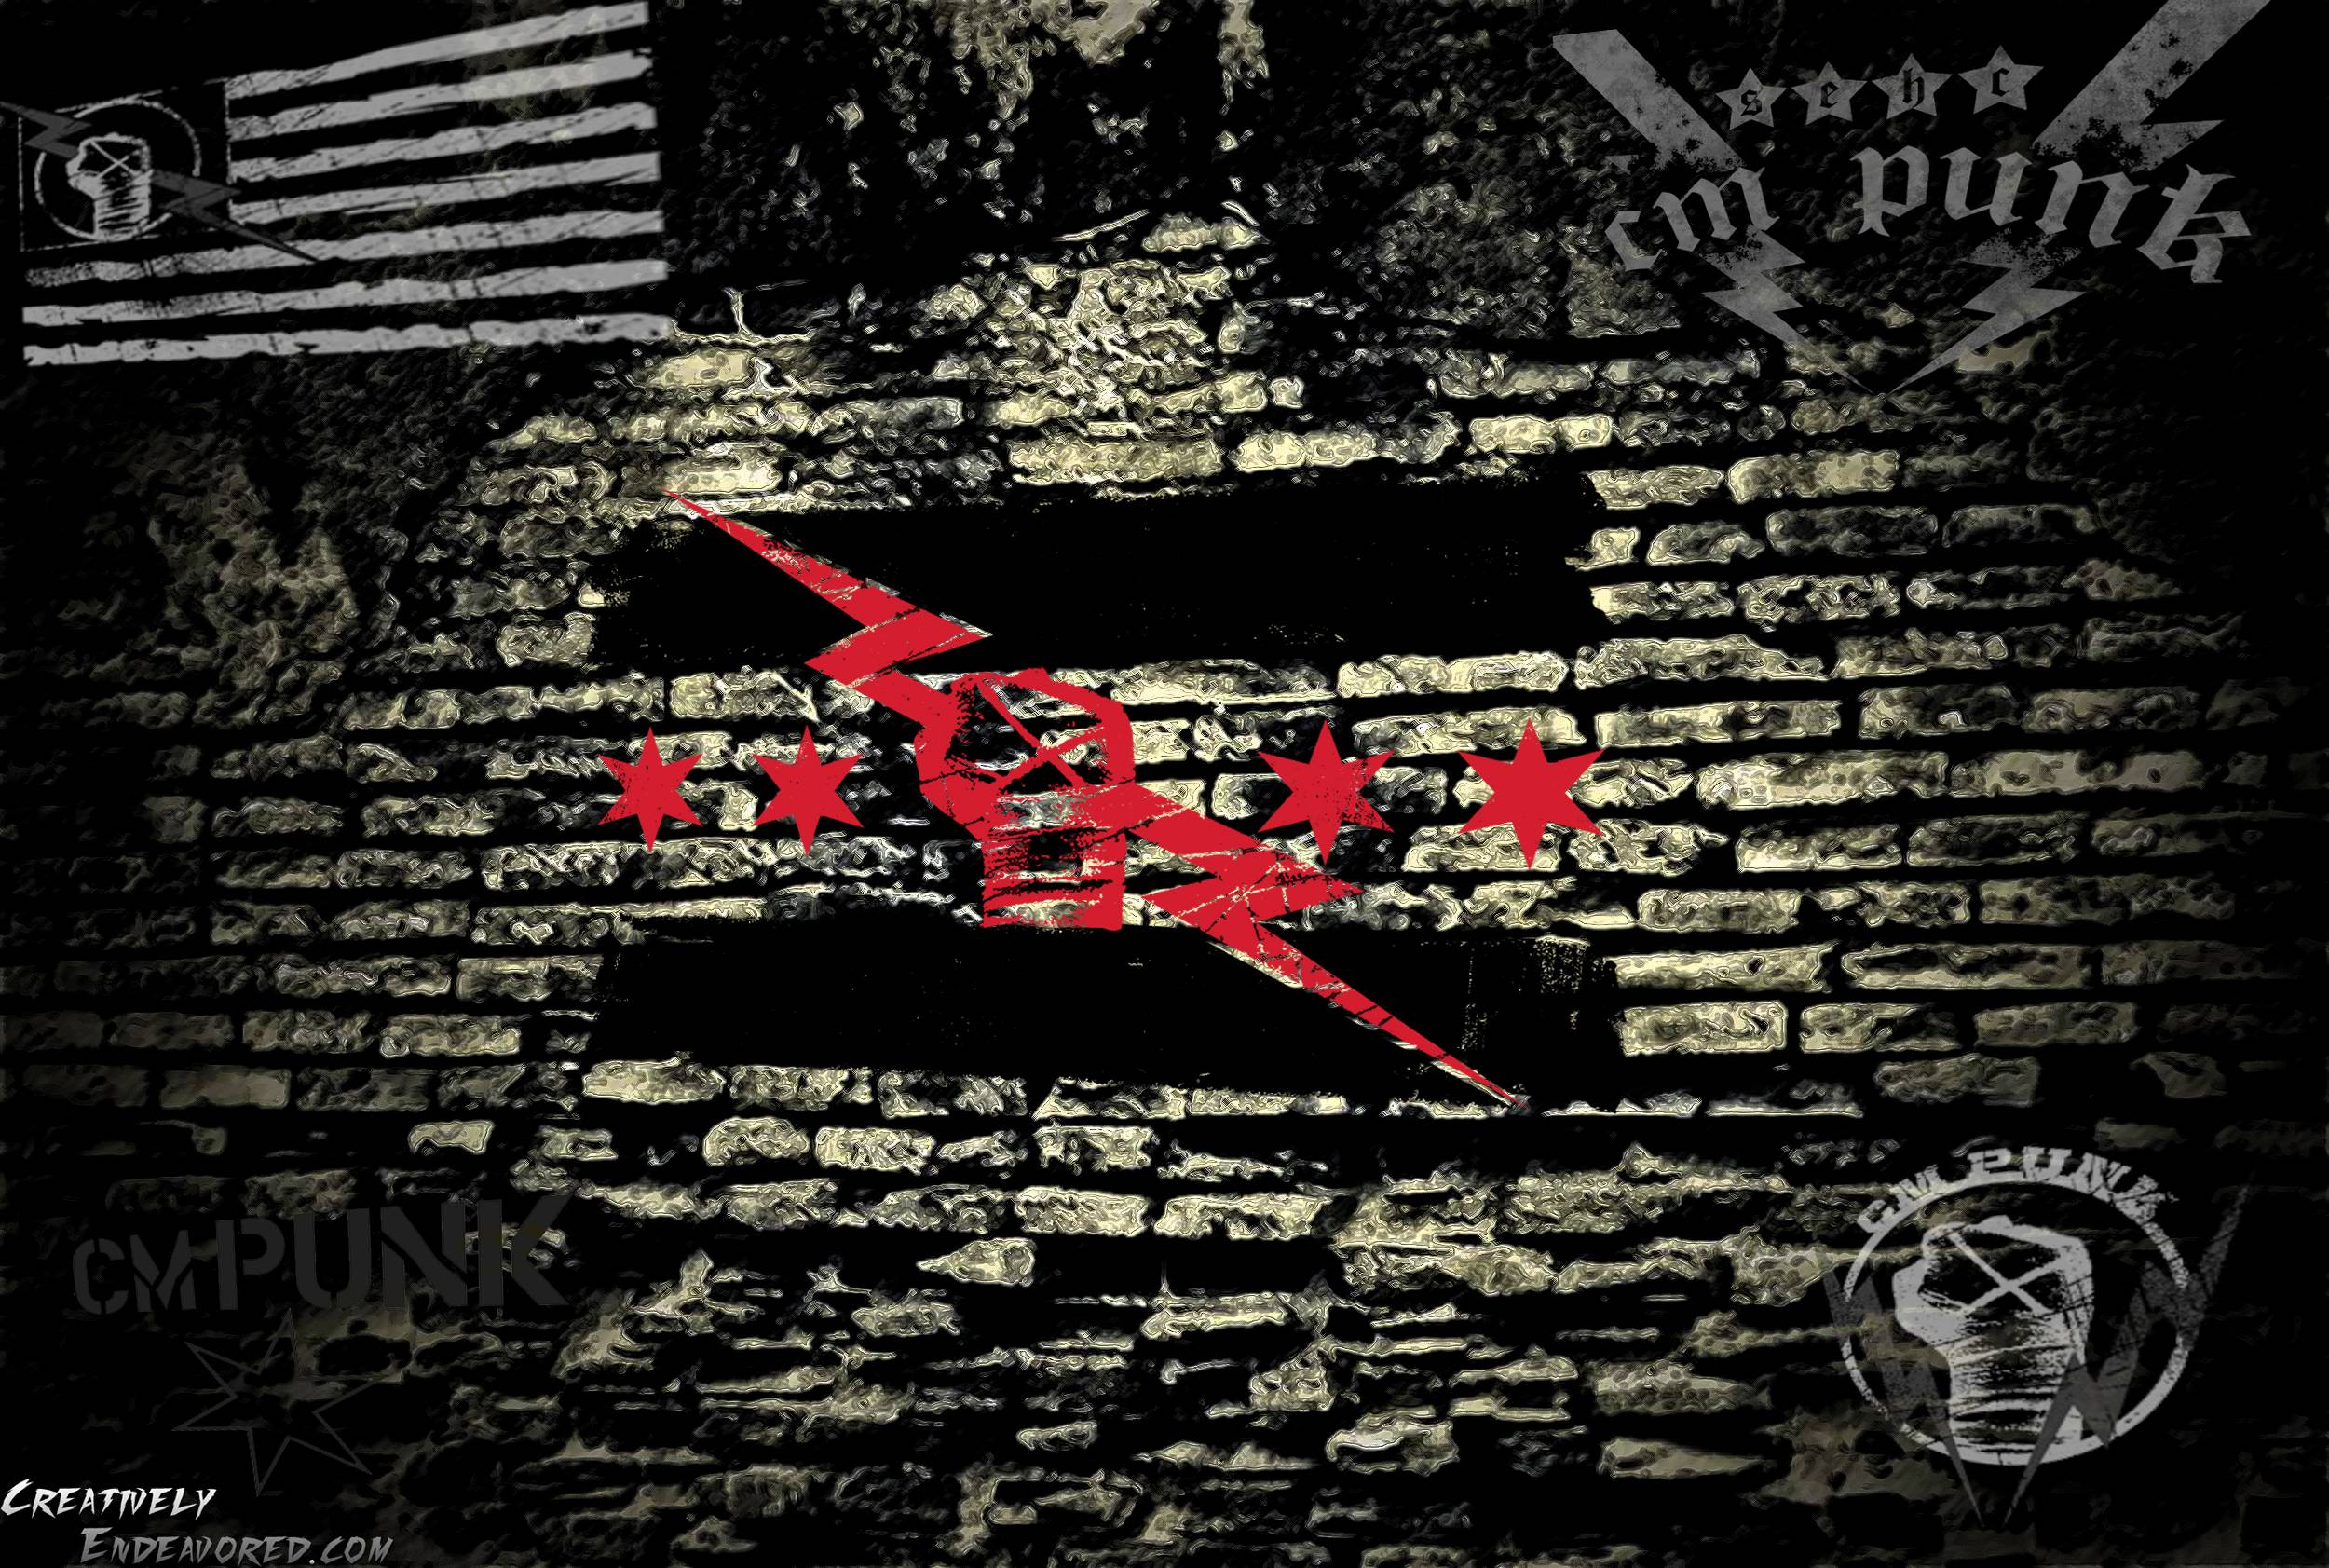 Cm punk logo wallpapers wallpaper cave - Wallpapers punk ...